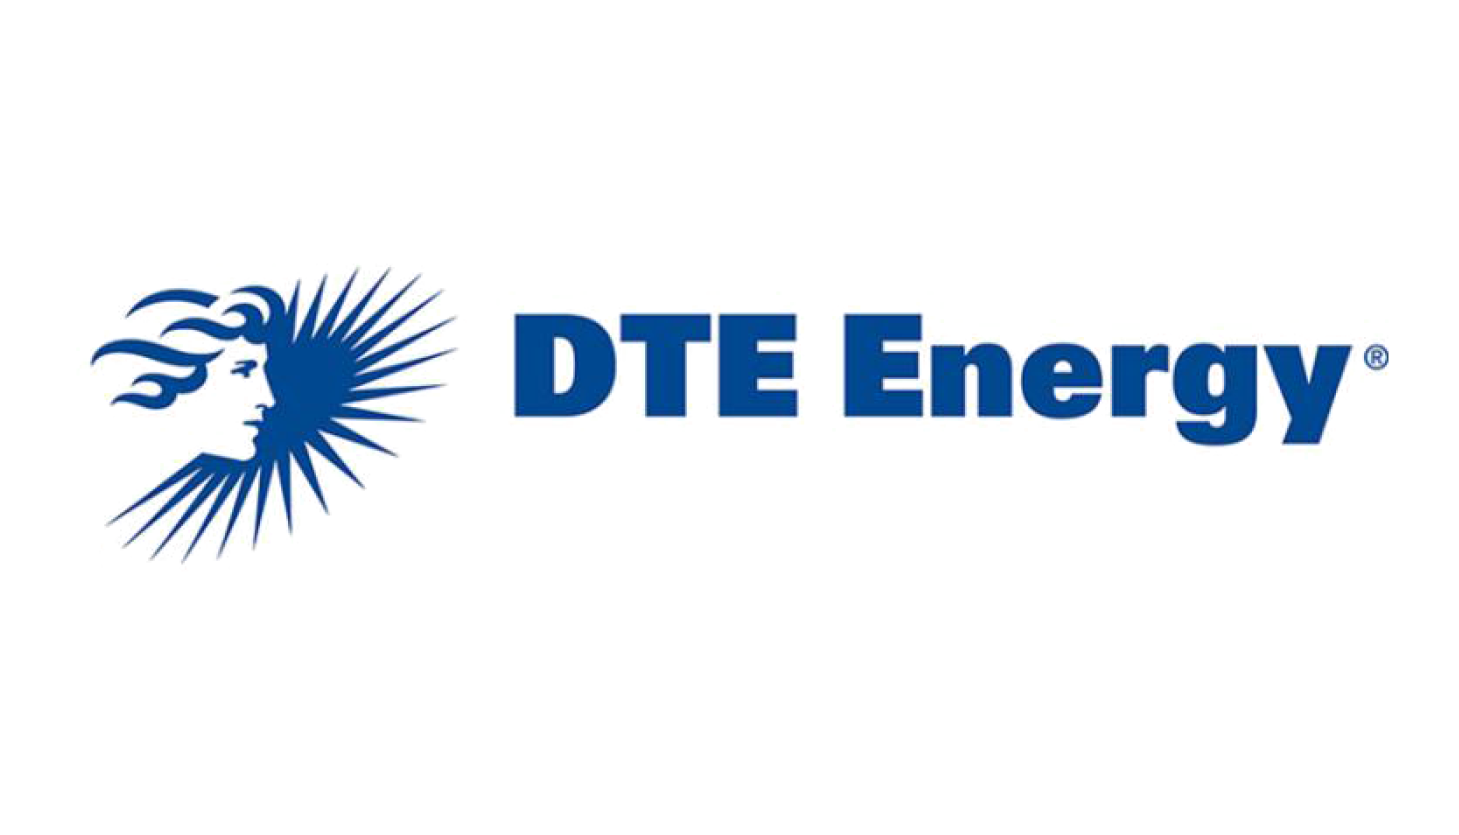 DevonWay-Logos-Scroller-DTE-Energy